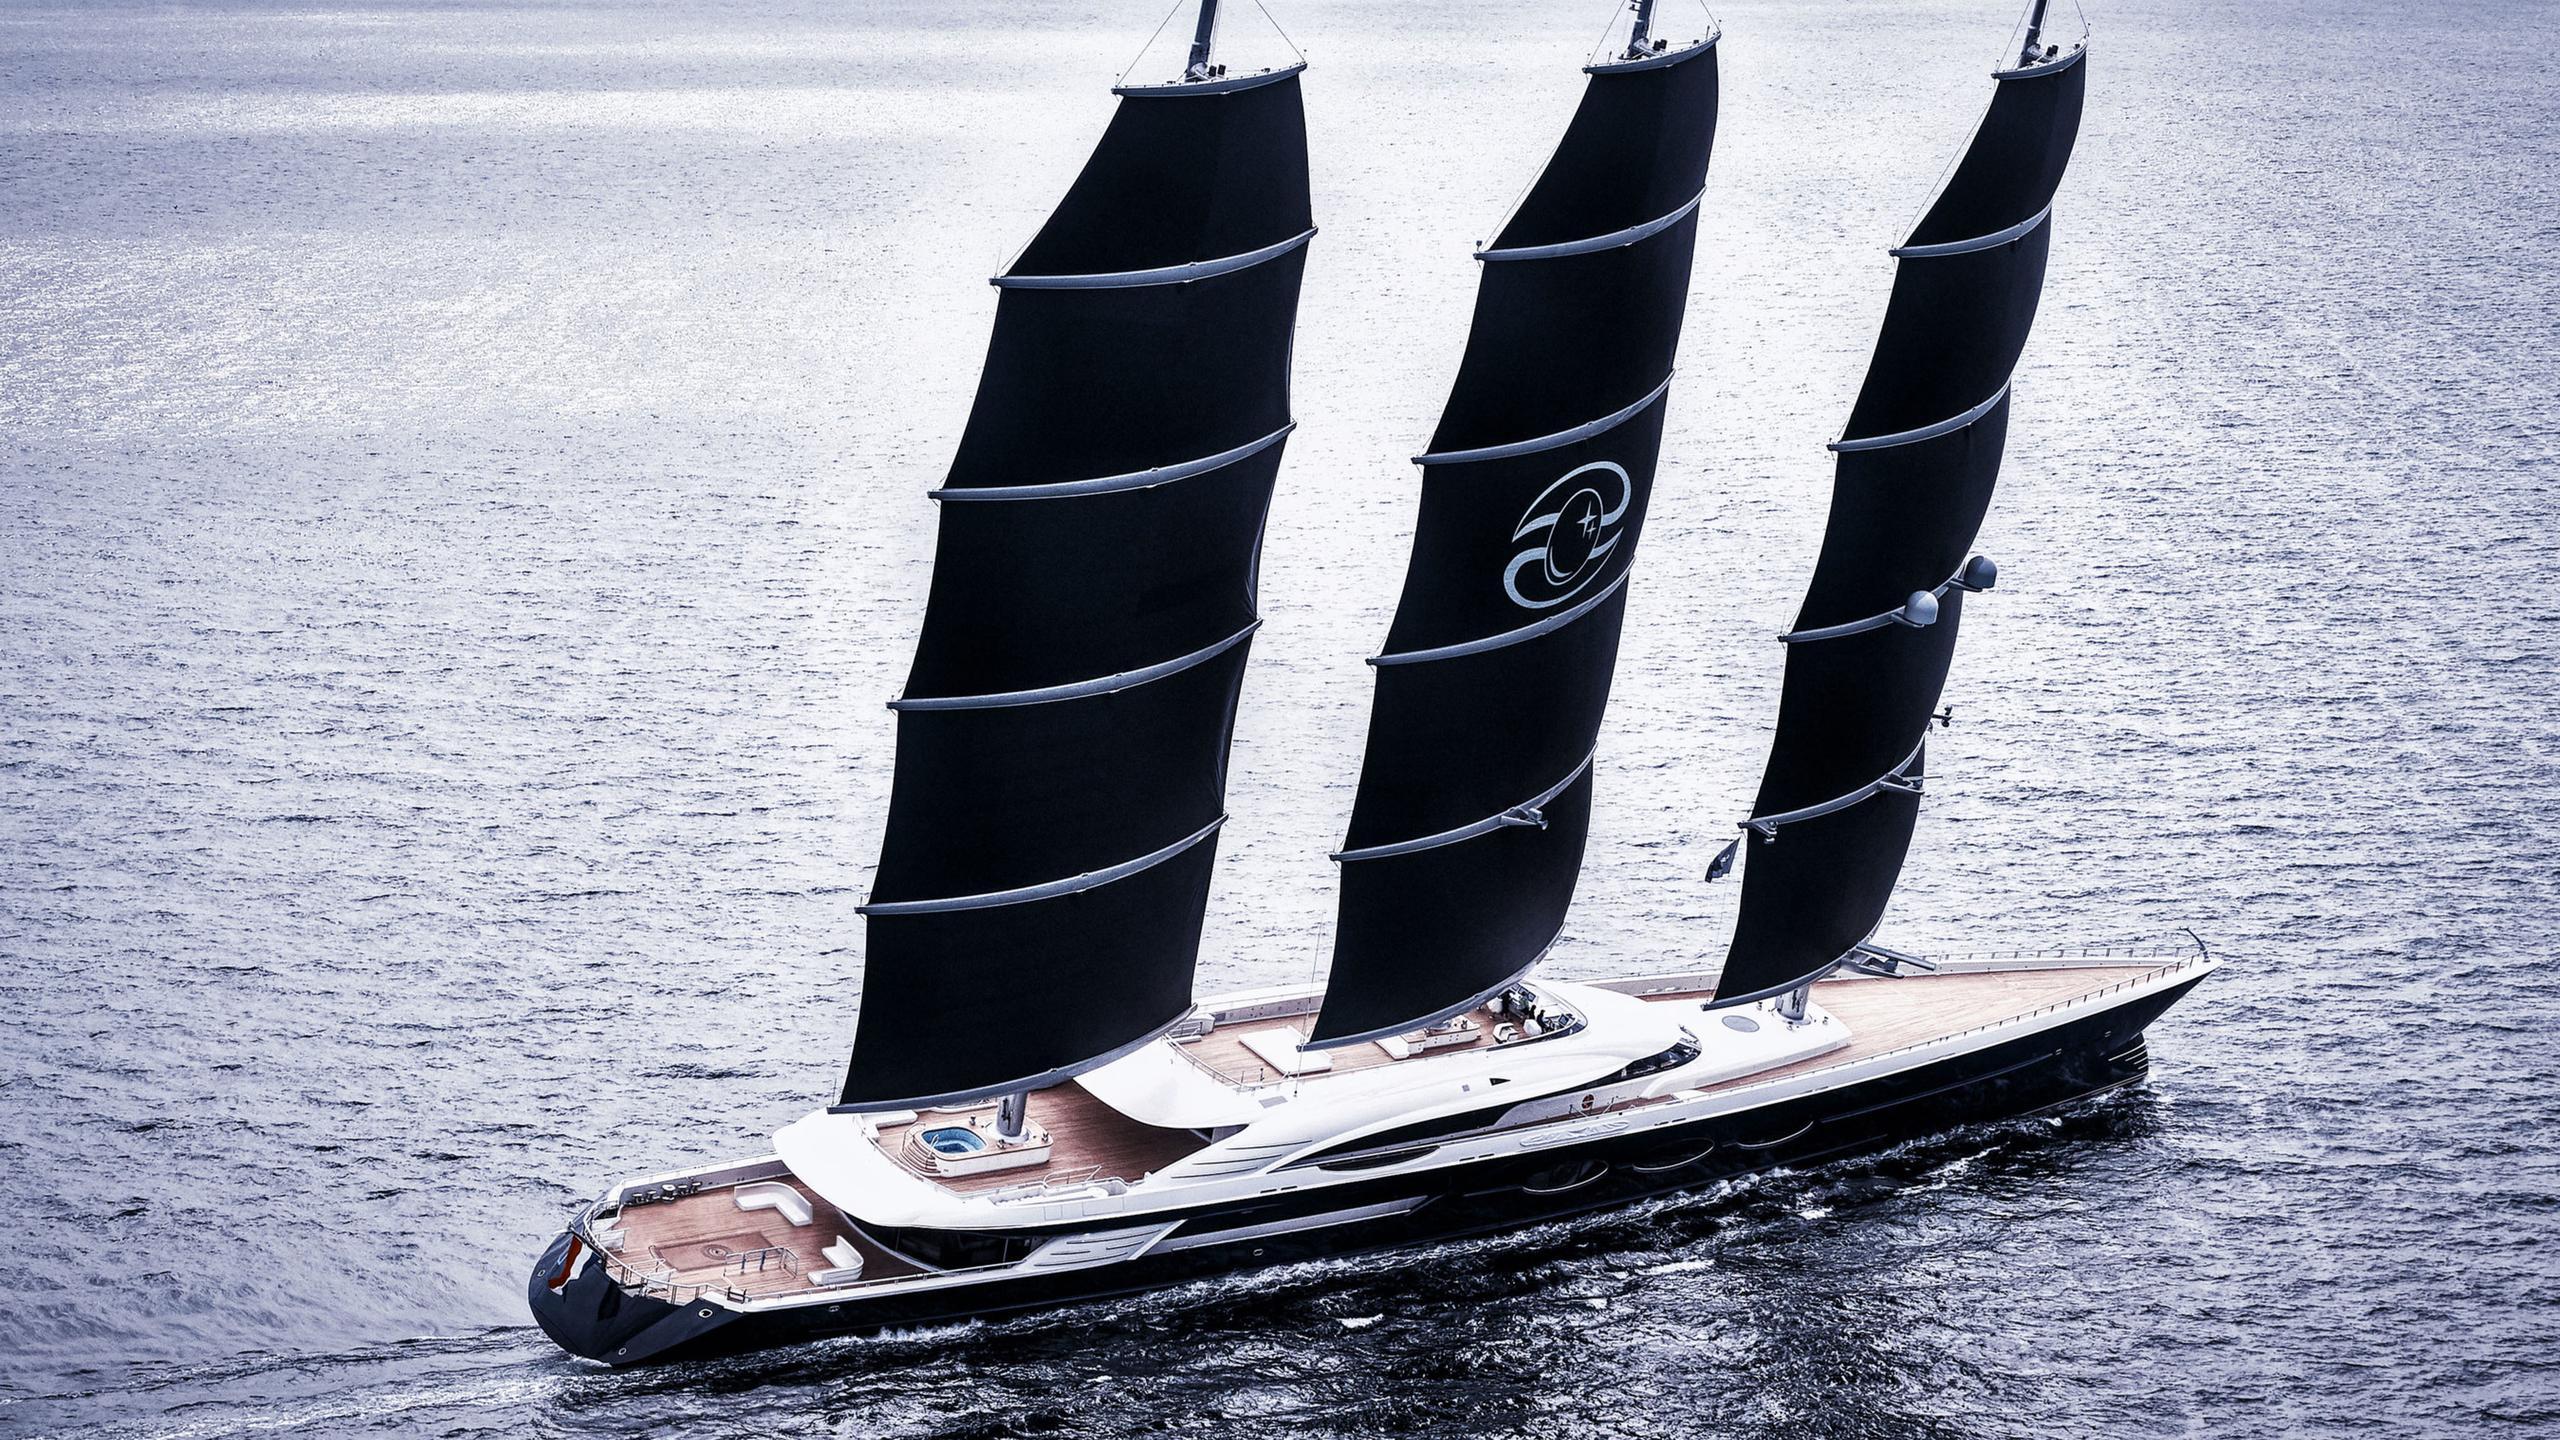 black pearl sailing yacht oceanco 107m 2018 half stern